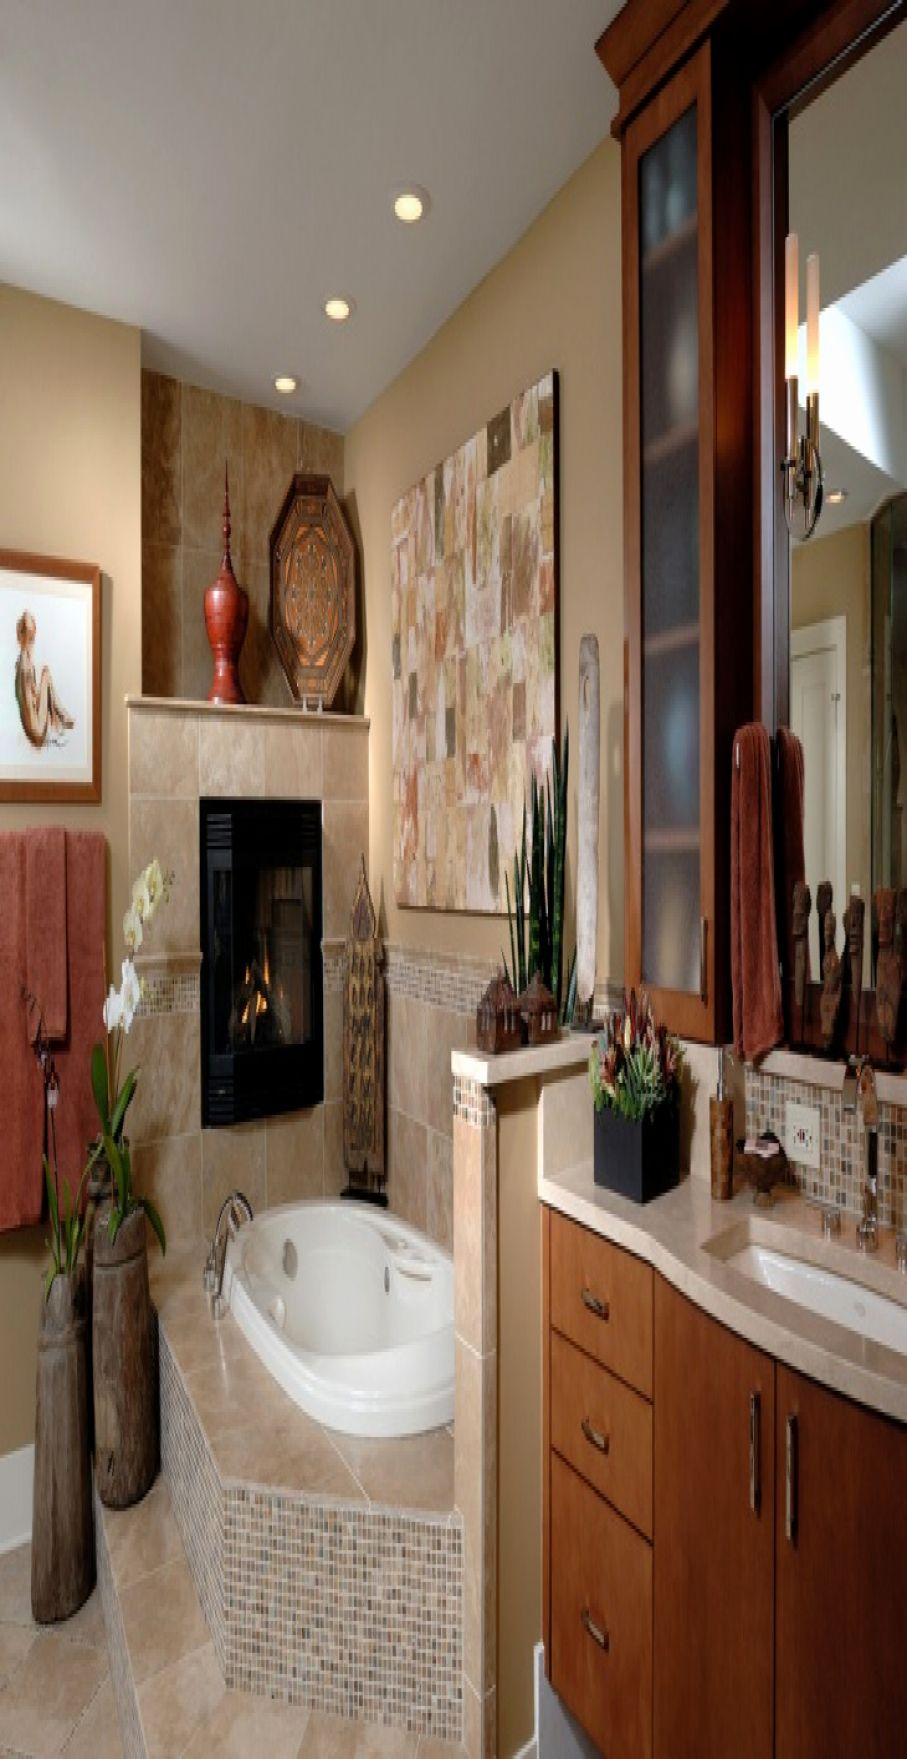 47 Beautiful Spa Bathroom Decorating Ideas | Spa bathroom ...